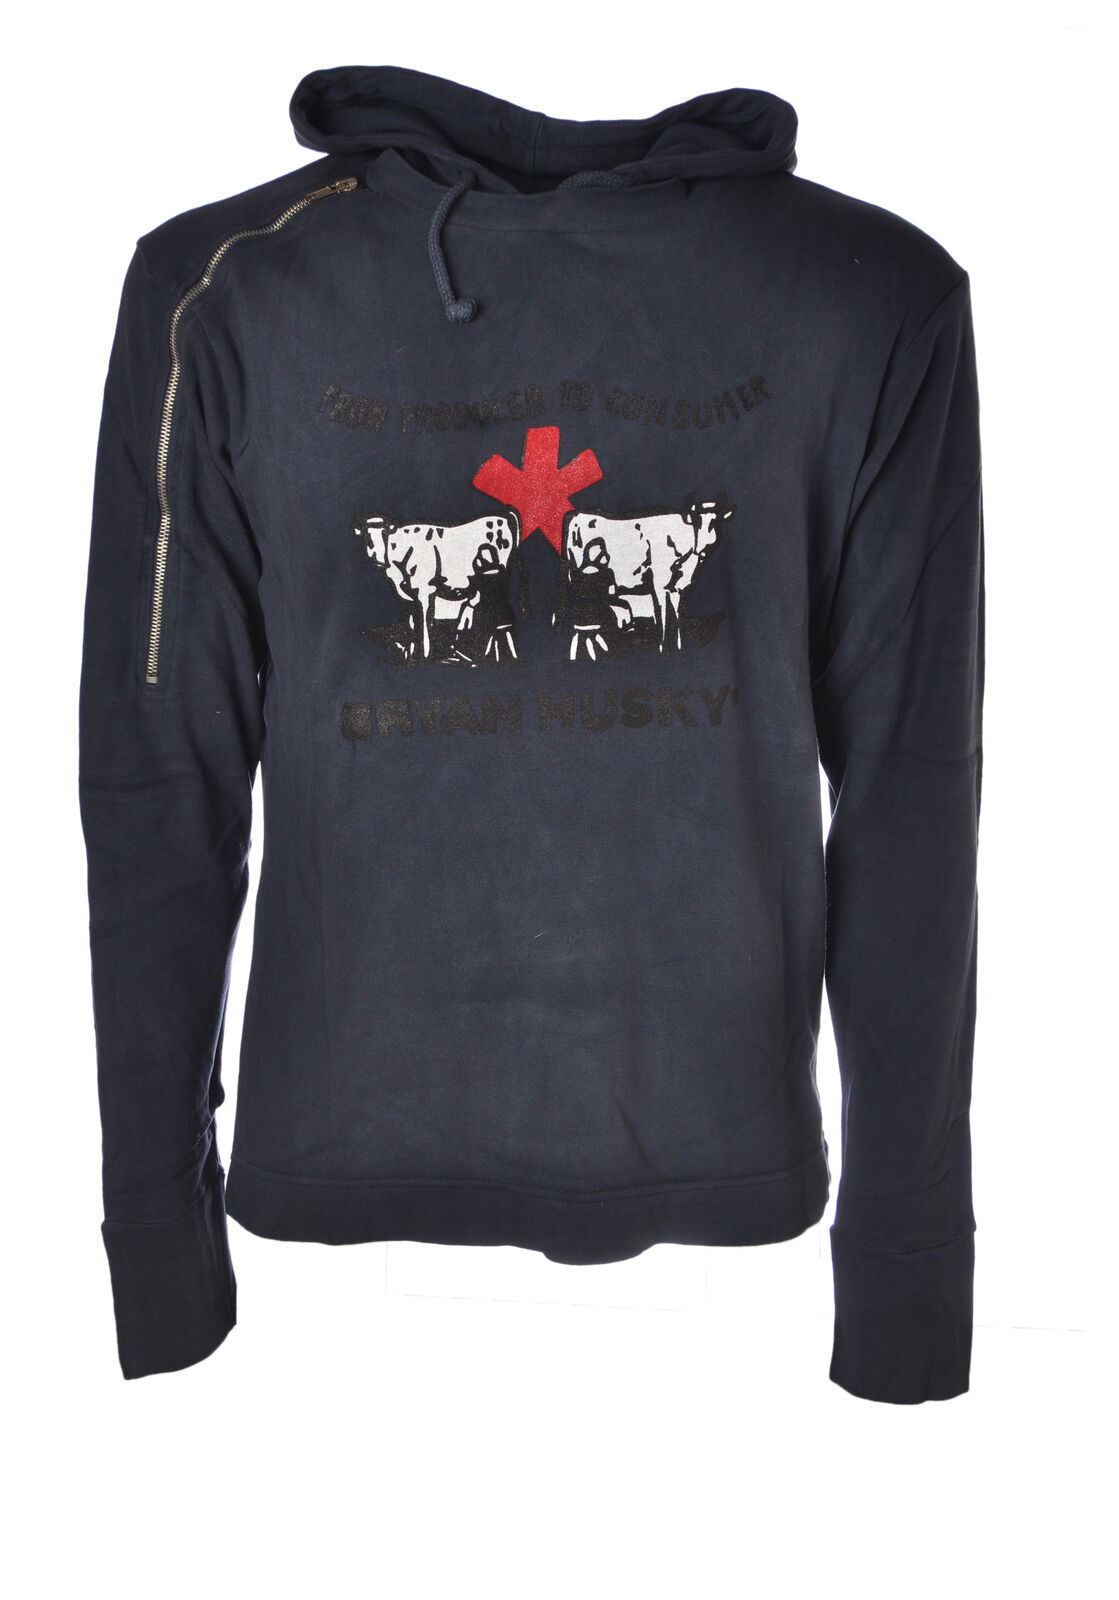 Bryan Sweatshirts Husky  -  Sweatshirts Bryan - Männchen - Blau - 4544223A184128 10519c